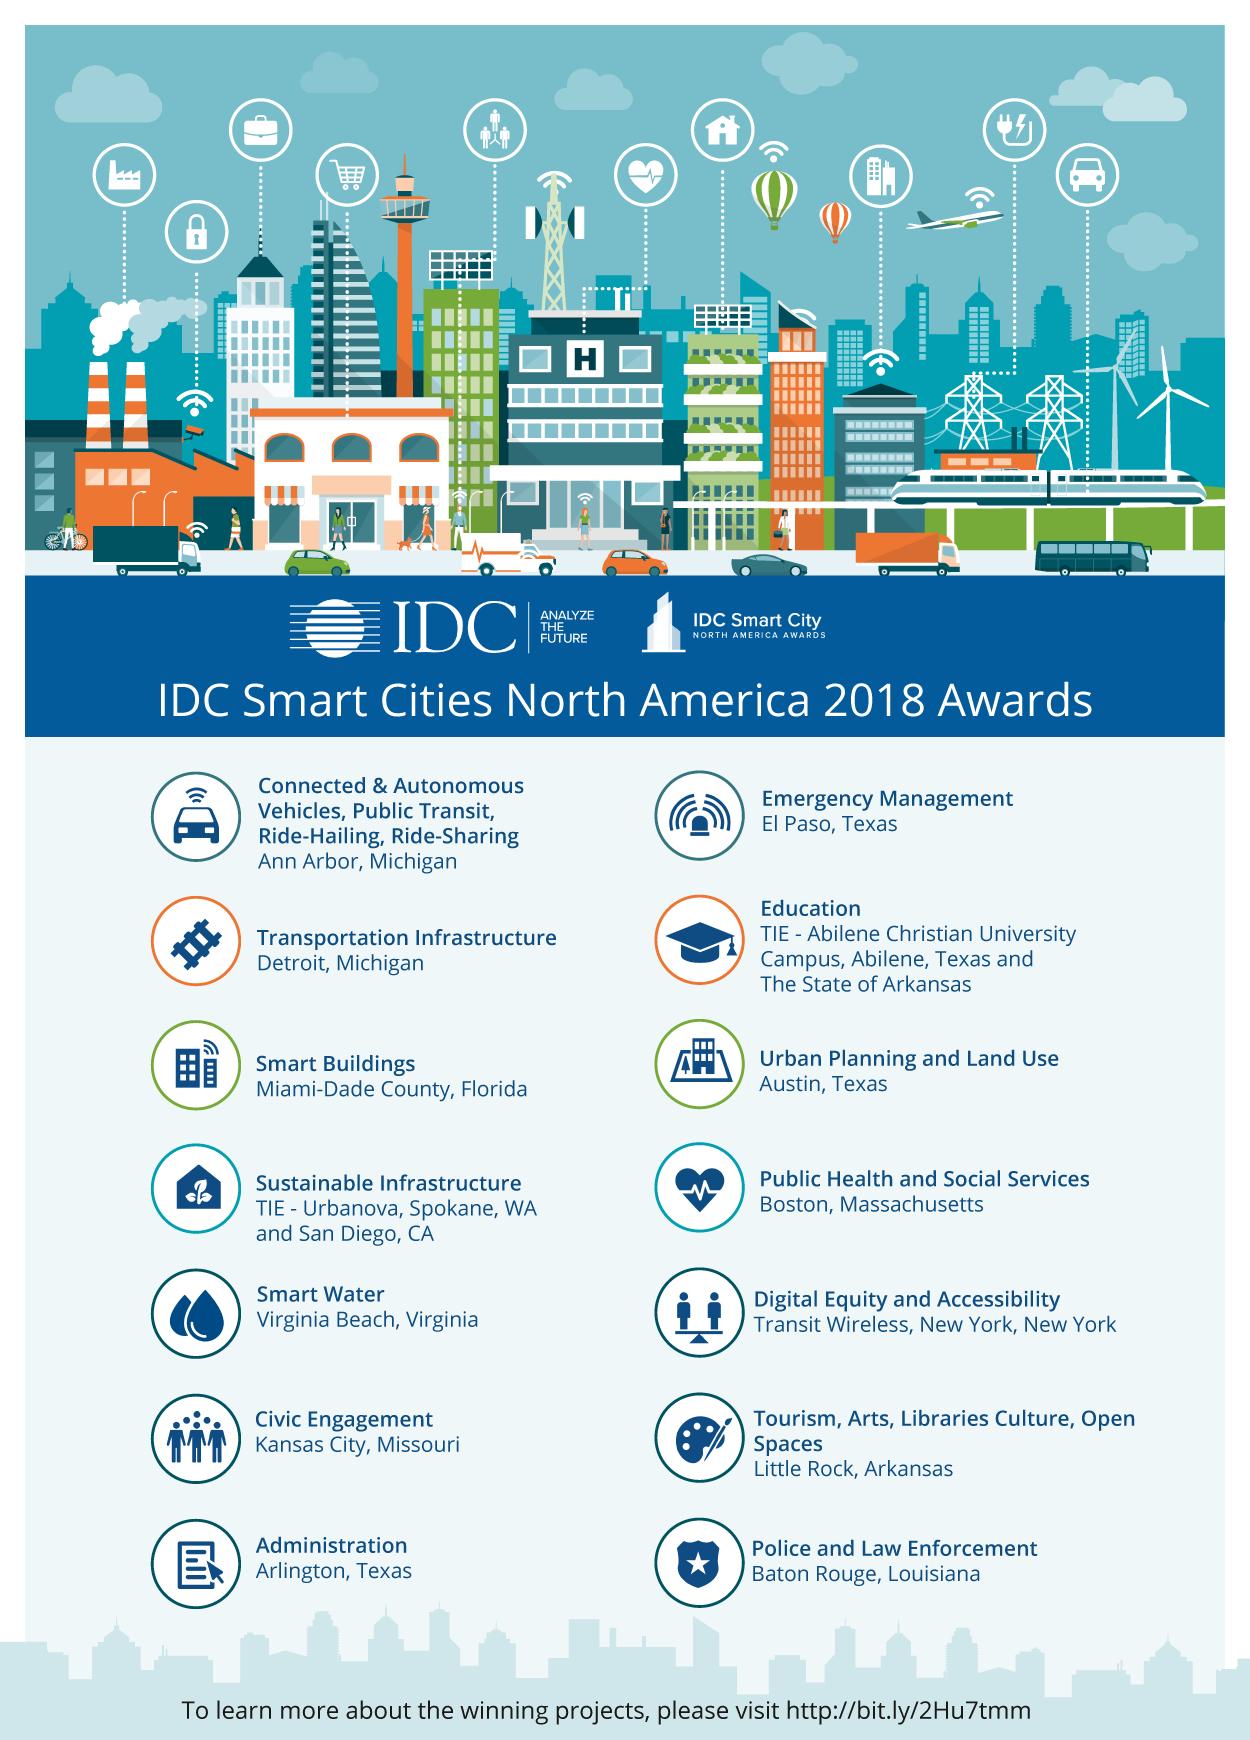 SYNDÉO WINS IDC Smart Cities North America Award!